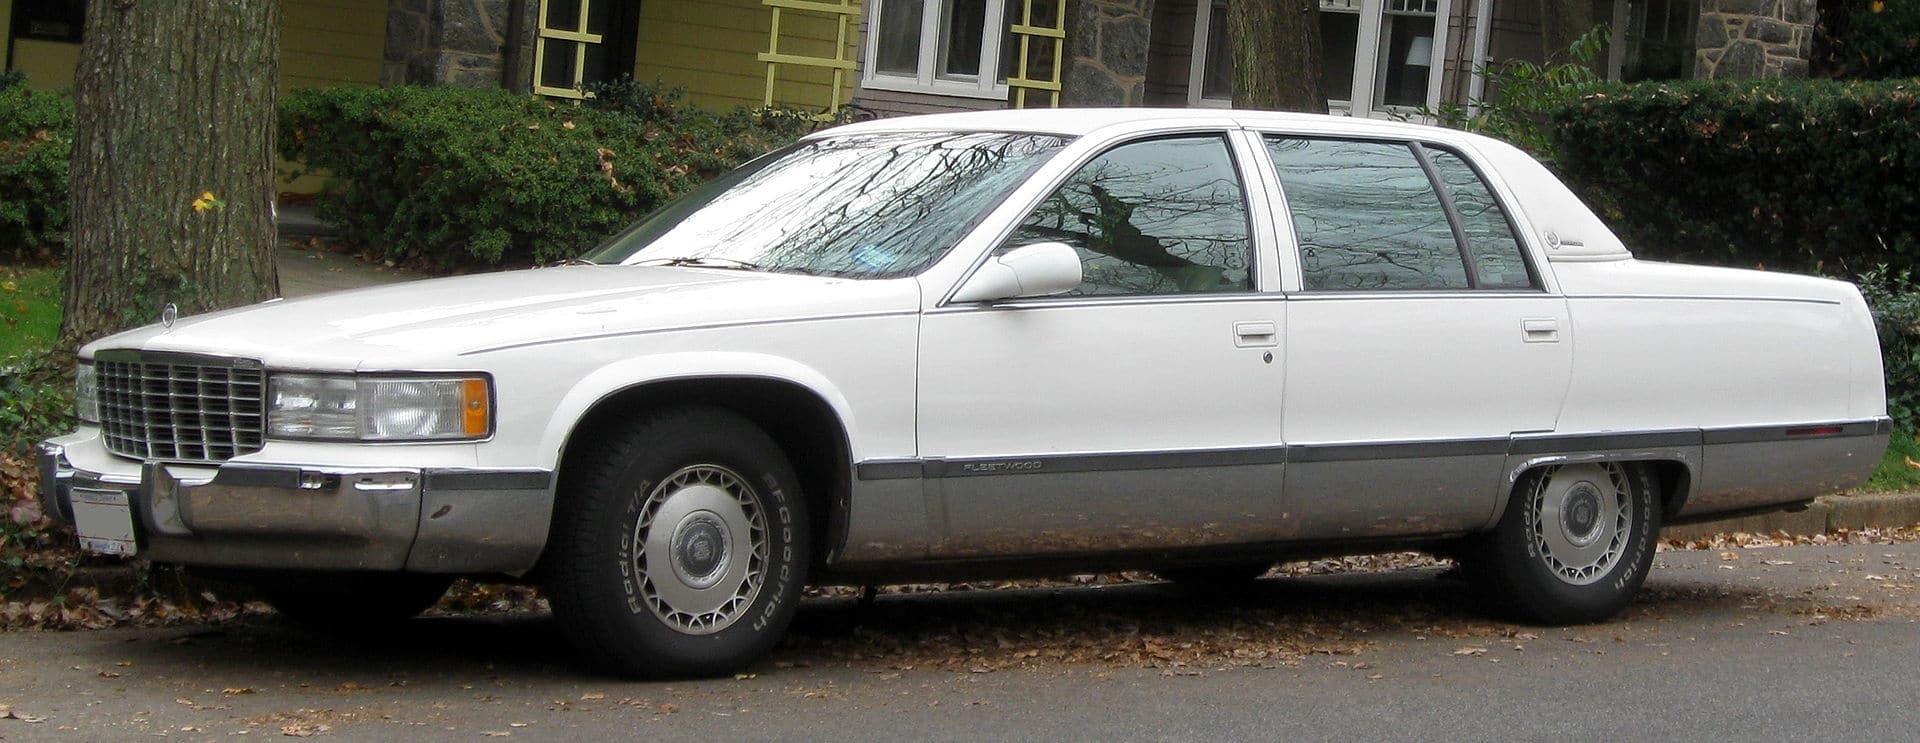 Cadillac Fleetwood auto glass repair phoenix